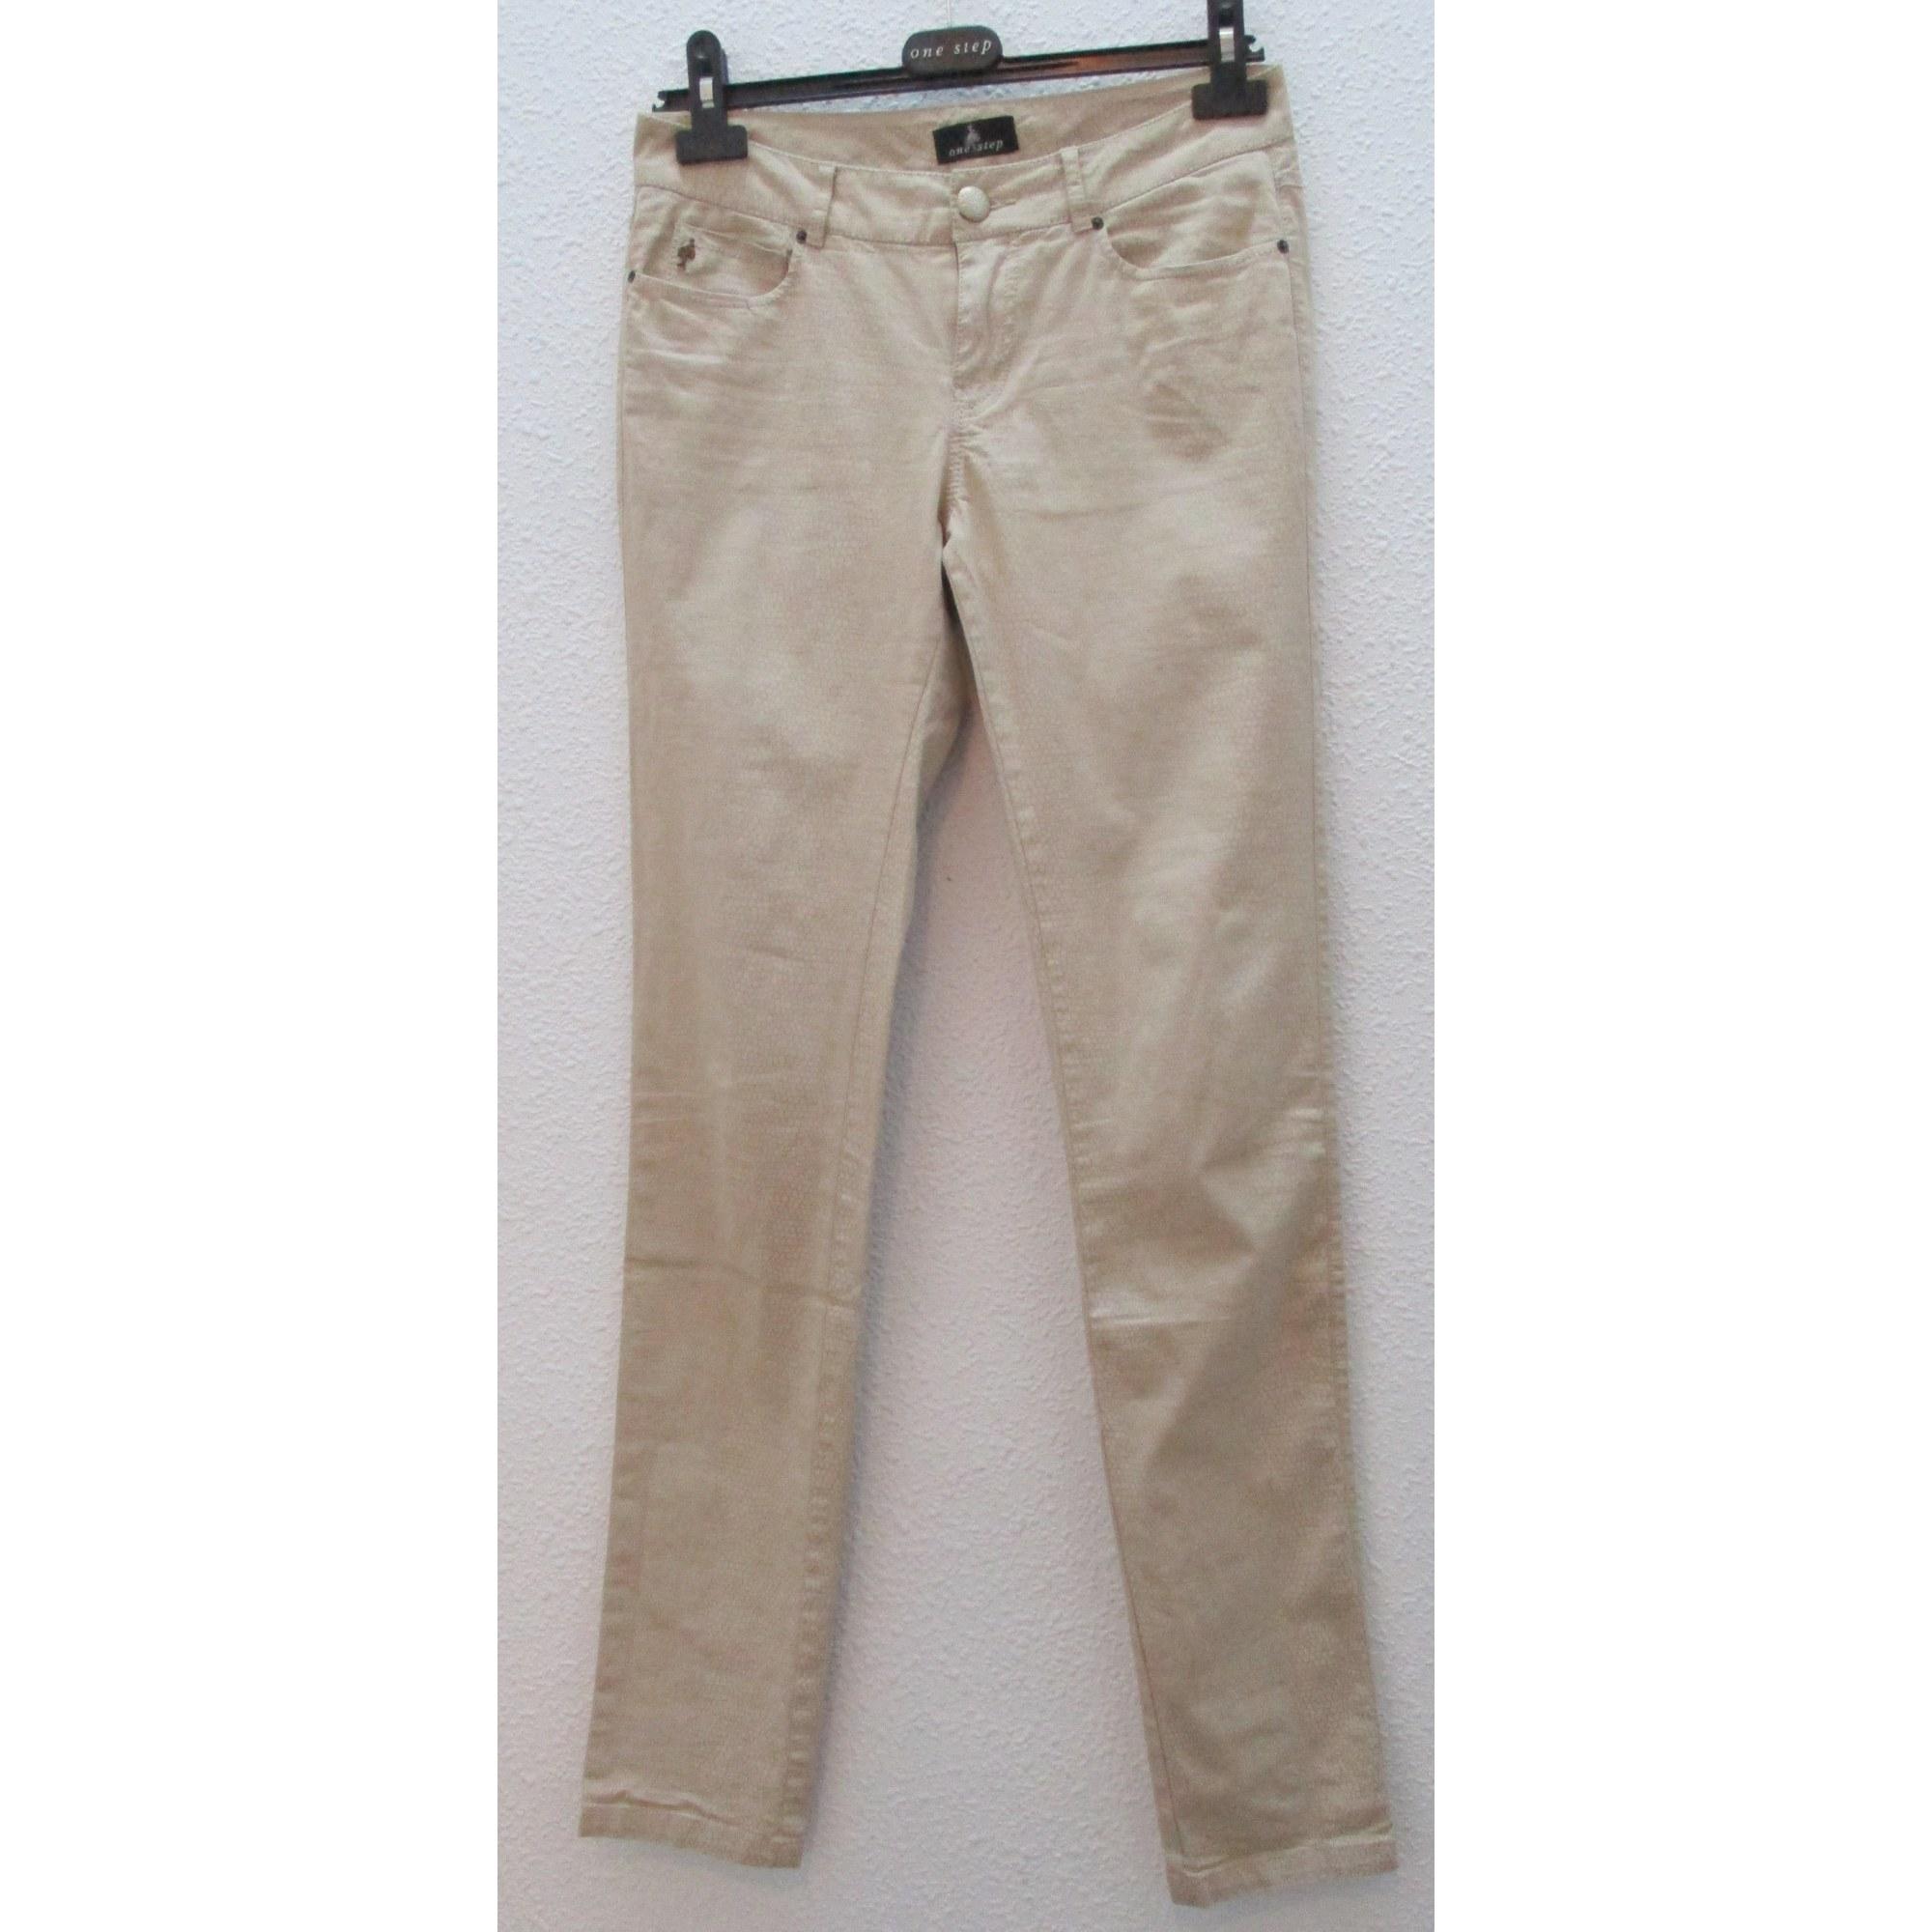 Jeans slim ONE STEP Beige, camel